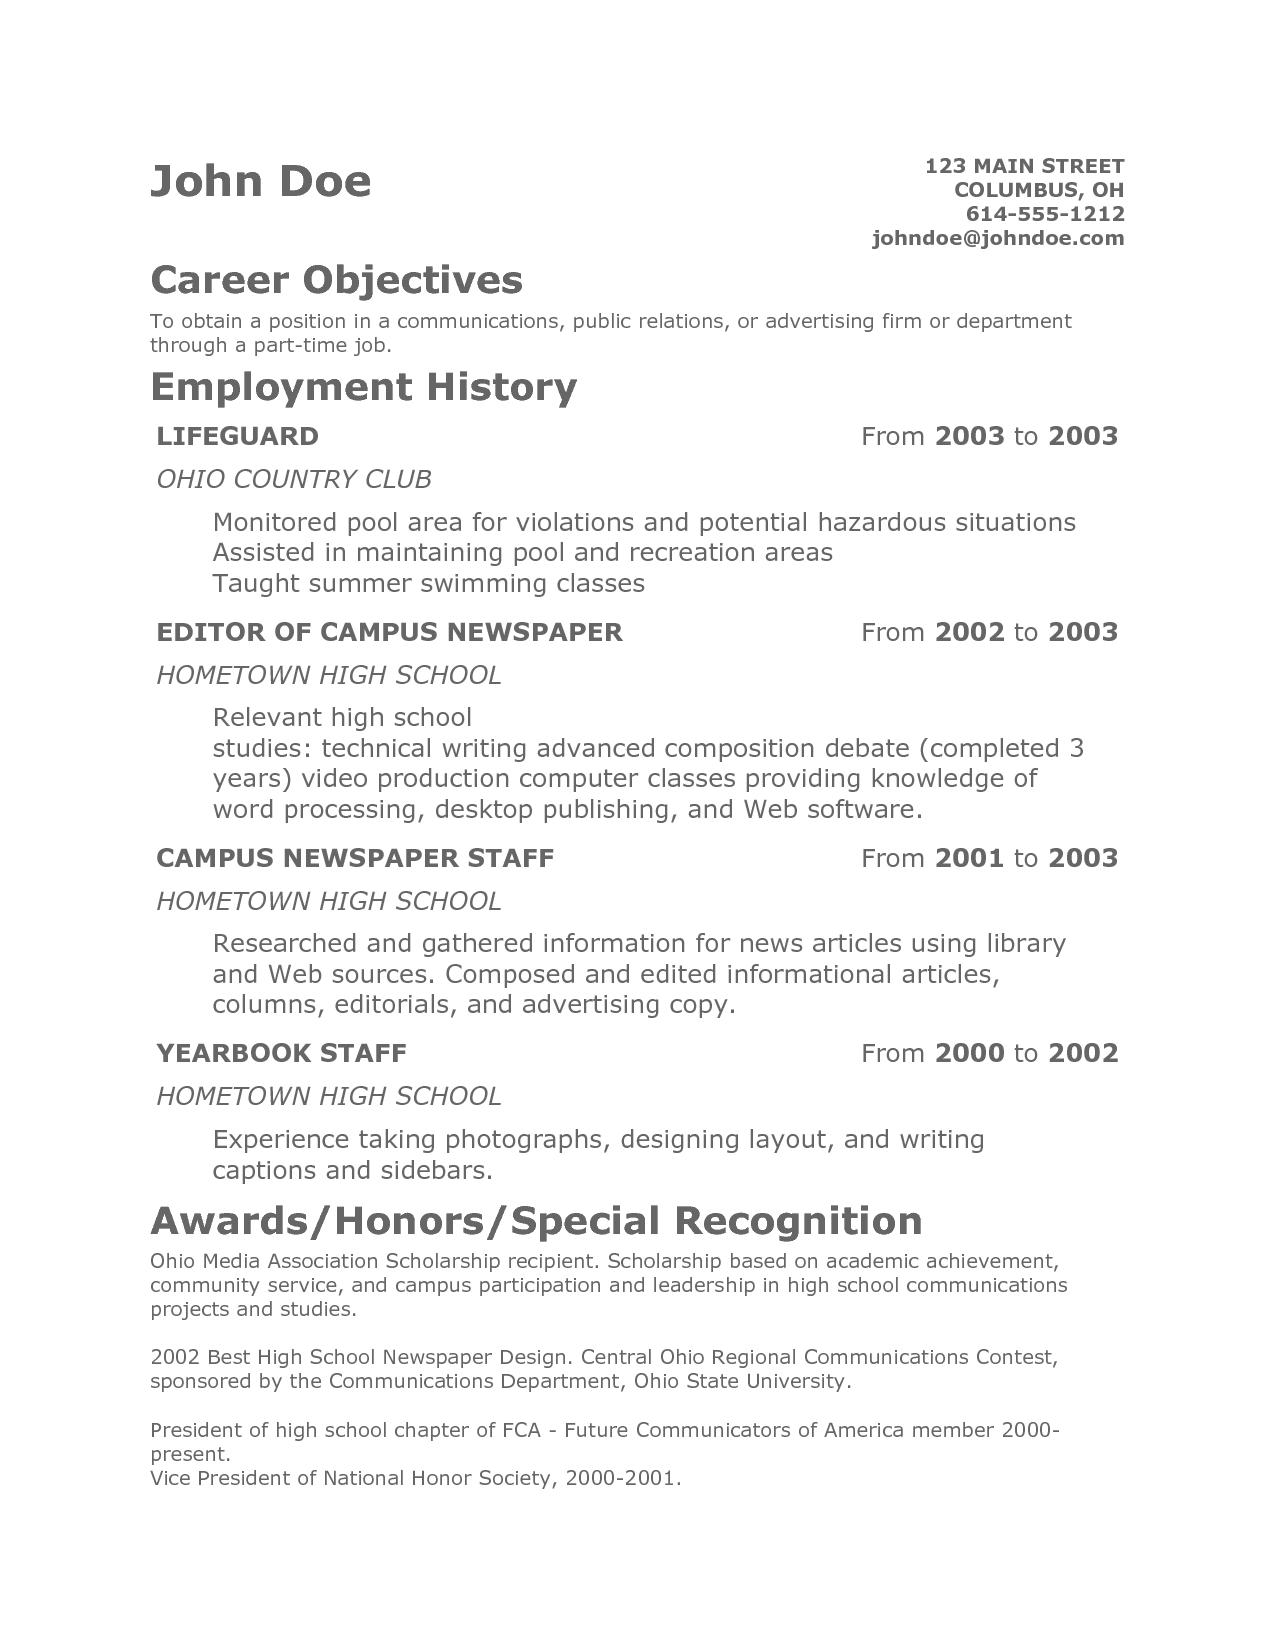 A Teenage Resume Examples | Pinterest | Resume examples, Resume ...